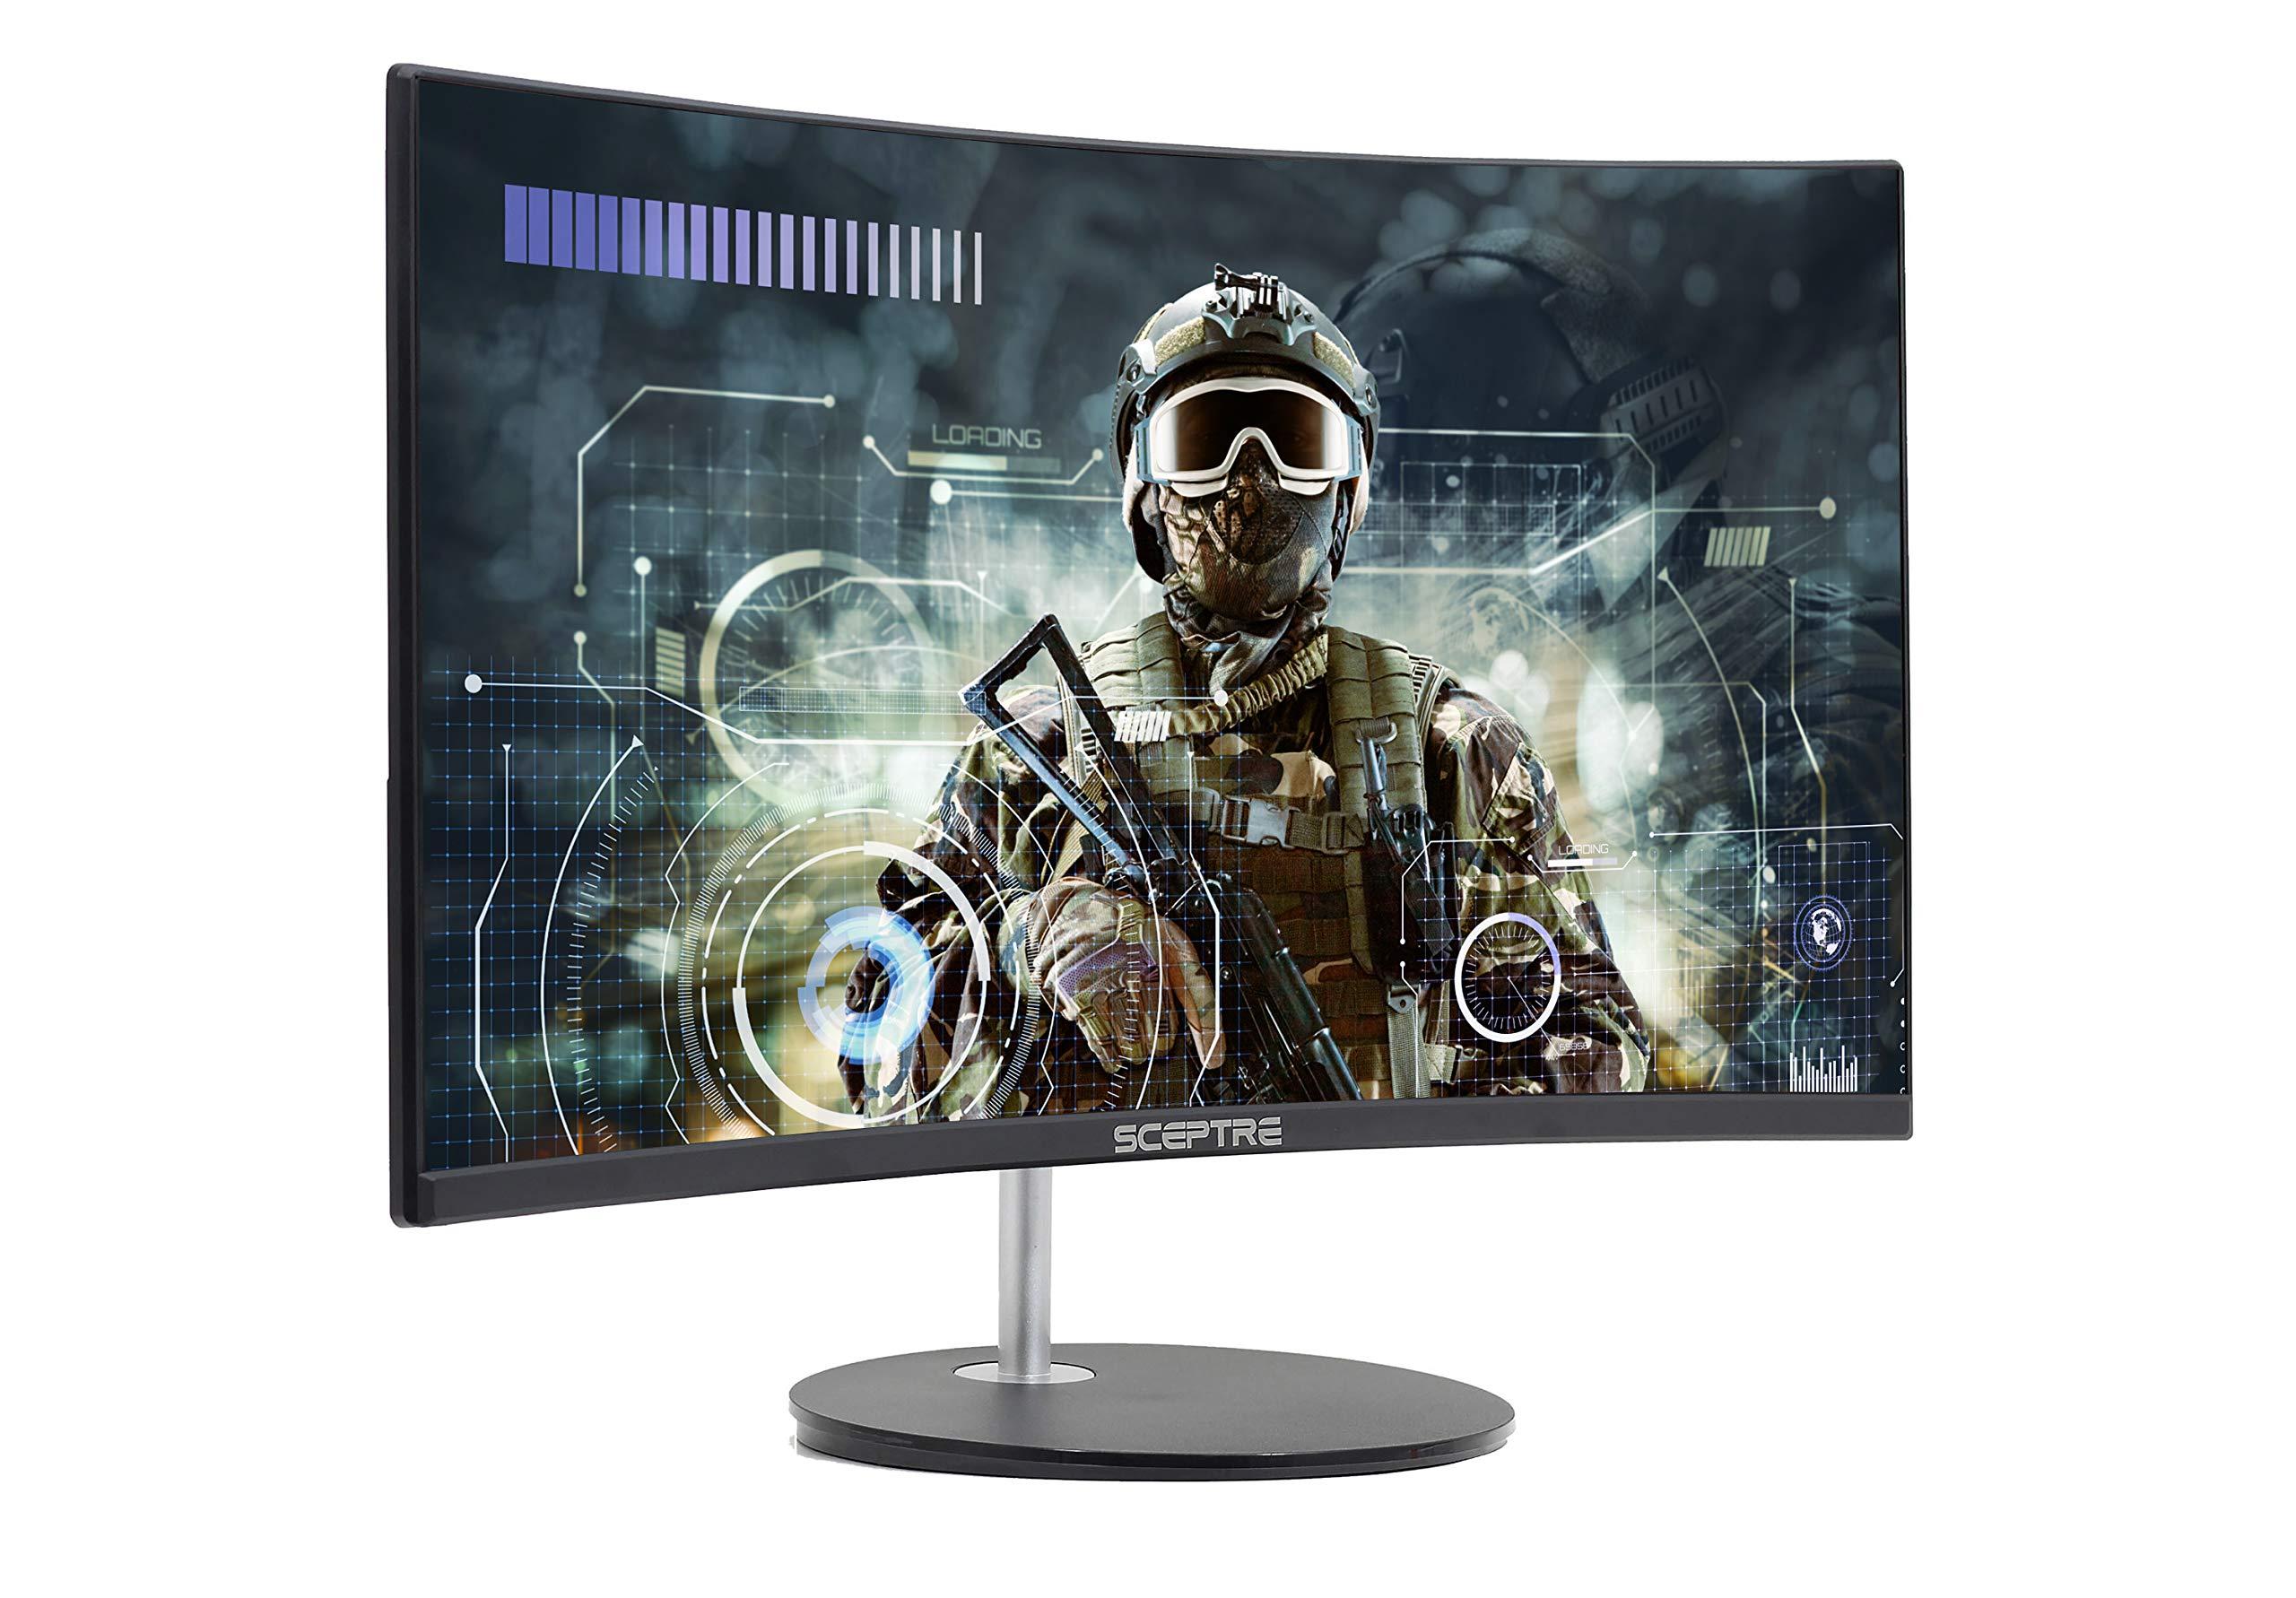 "Sceptre 24"" Curved 75Hz Gaming LED Monitor Full HD 1080P HDMI VGA Speakers, VESA Wall Mount Ready Metal Black 2019 (C248W-1920RN) 2"